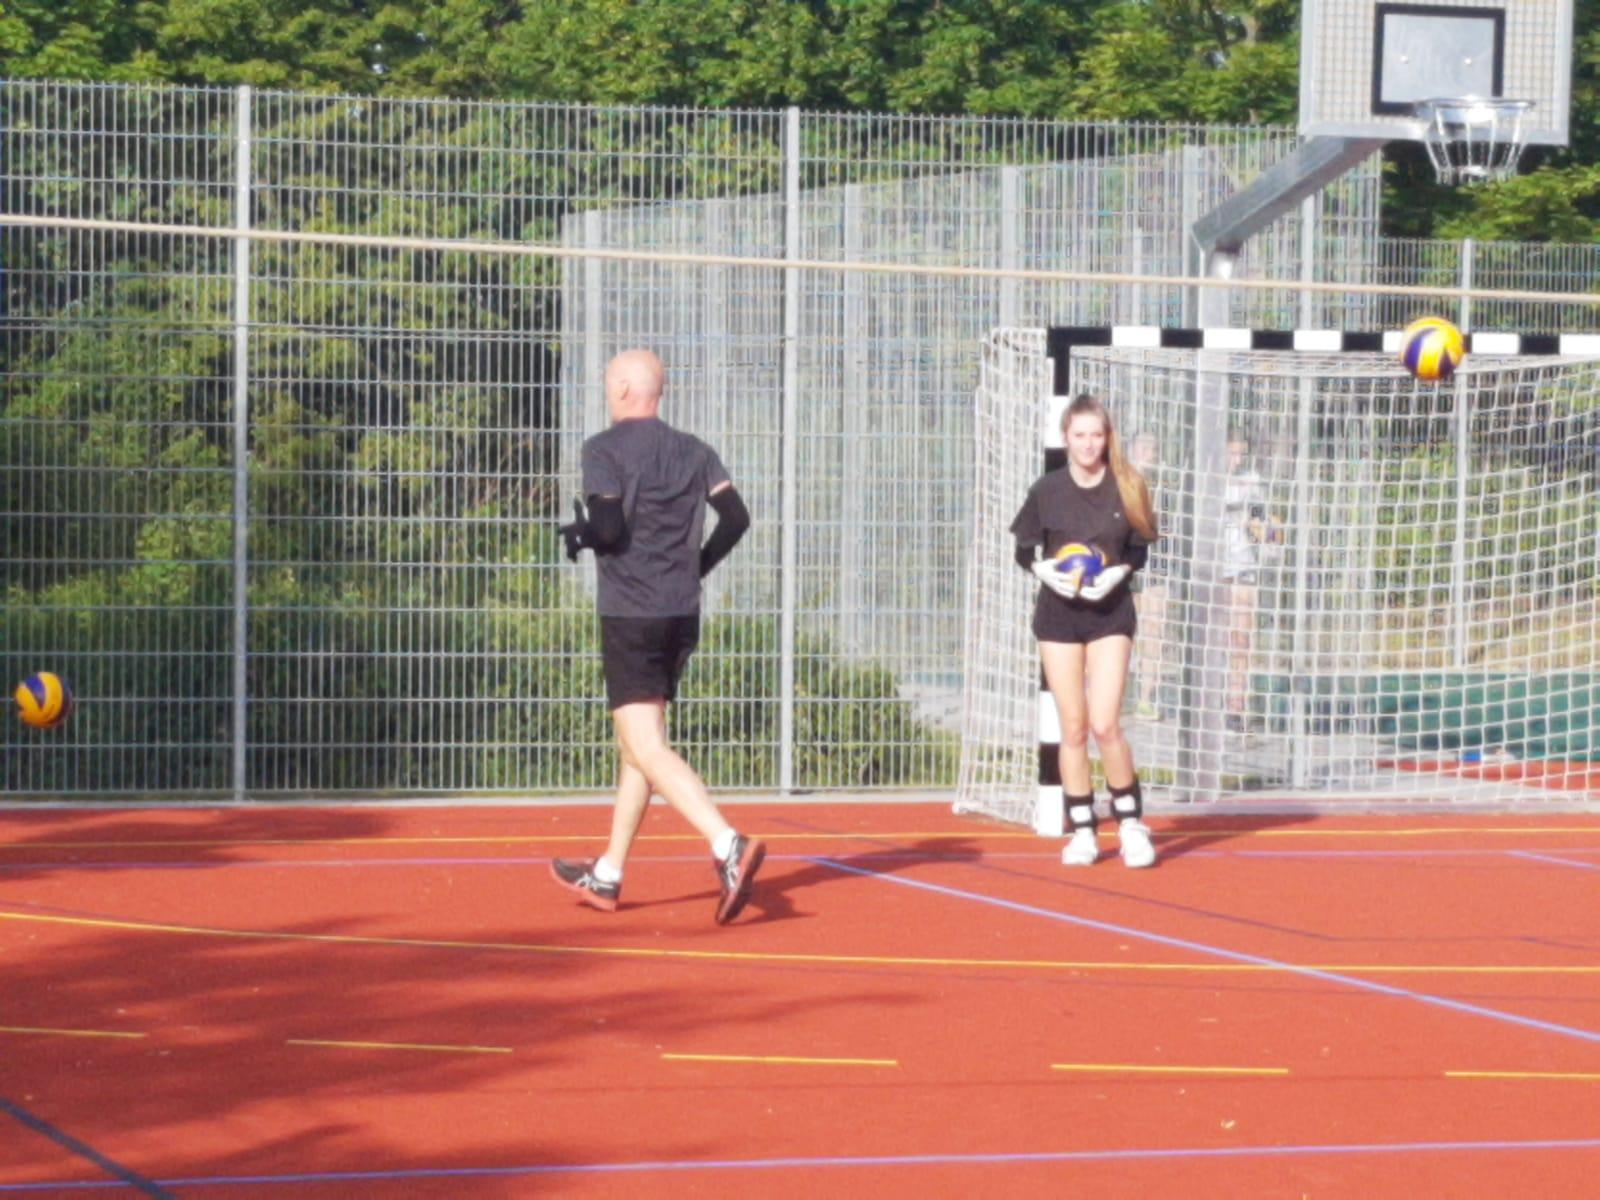 20200605_Volleyballdamen_Trainingsbeginn08